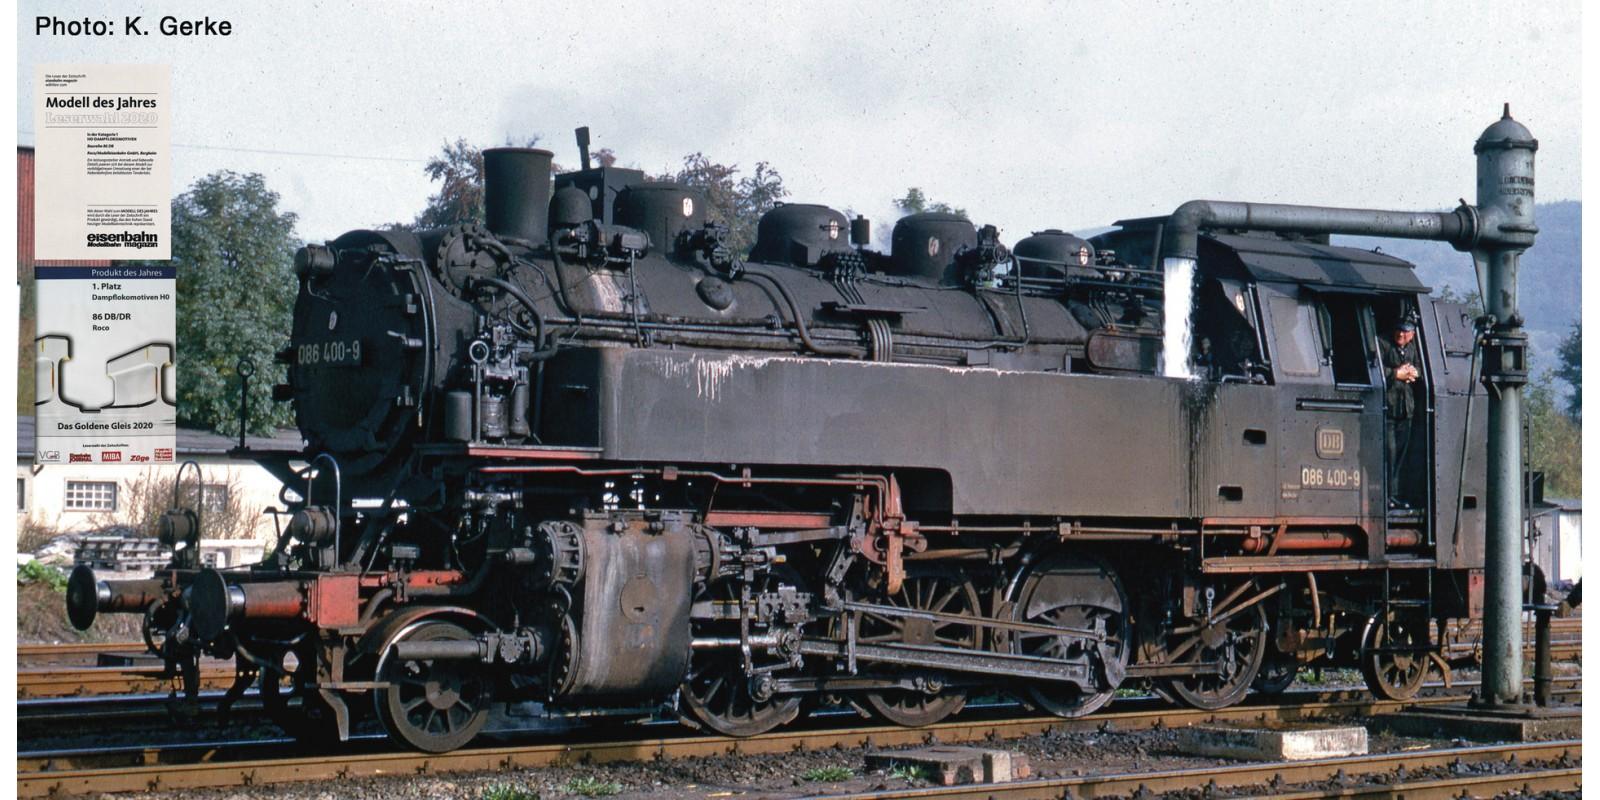 RO70317 Steam locomotive 086 400-9